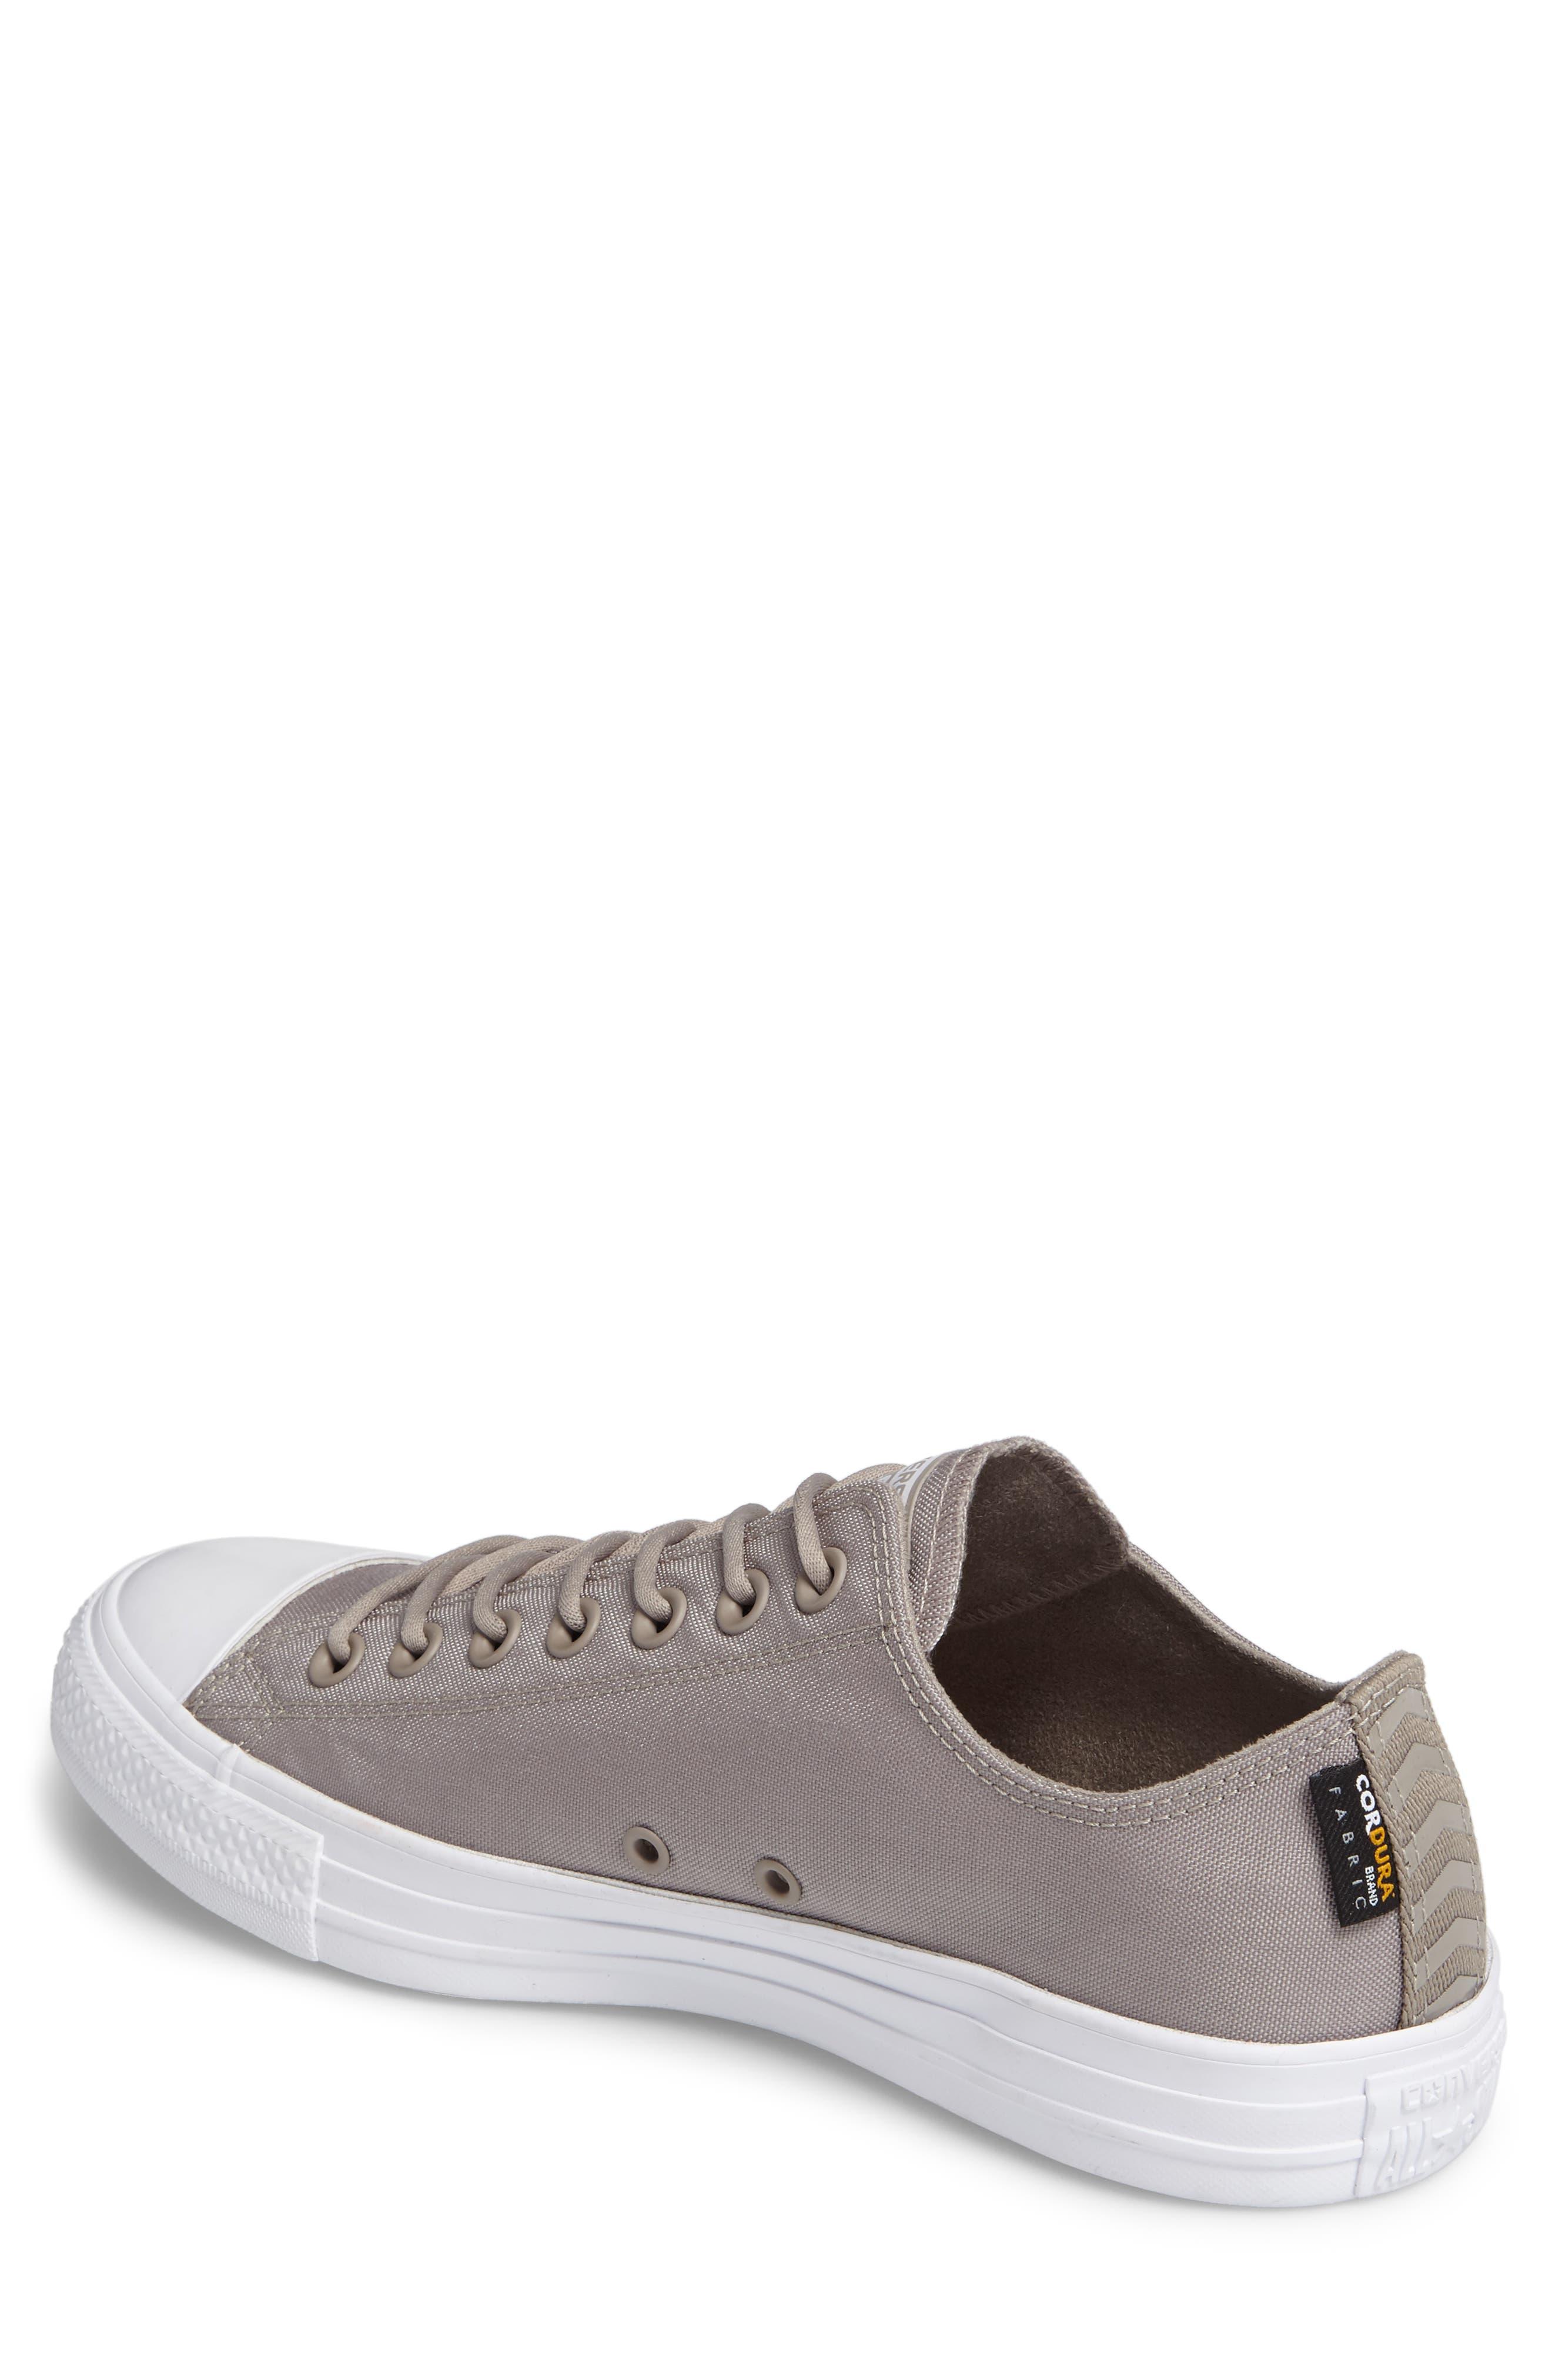 Alternate Image 2  - Converse Chuck Taylor® All Star® Ox Sneaker (Men)